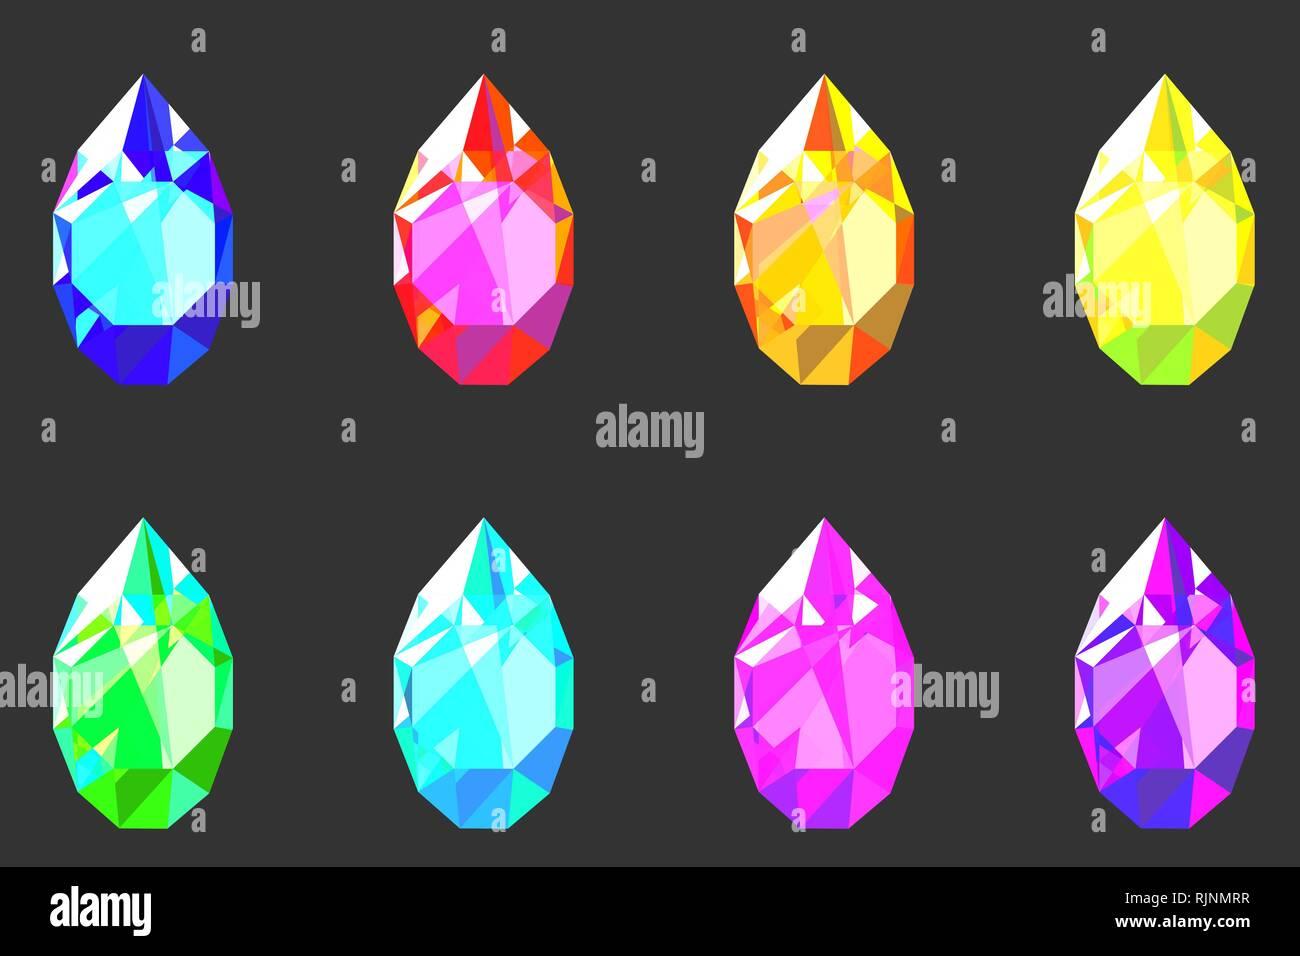 Gem Stones Stock Photos & Gem Stones Stock Images - Alamy